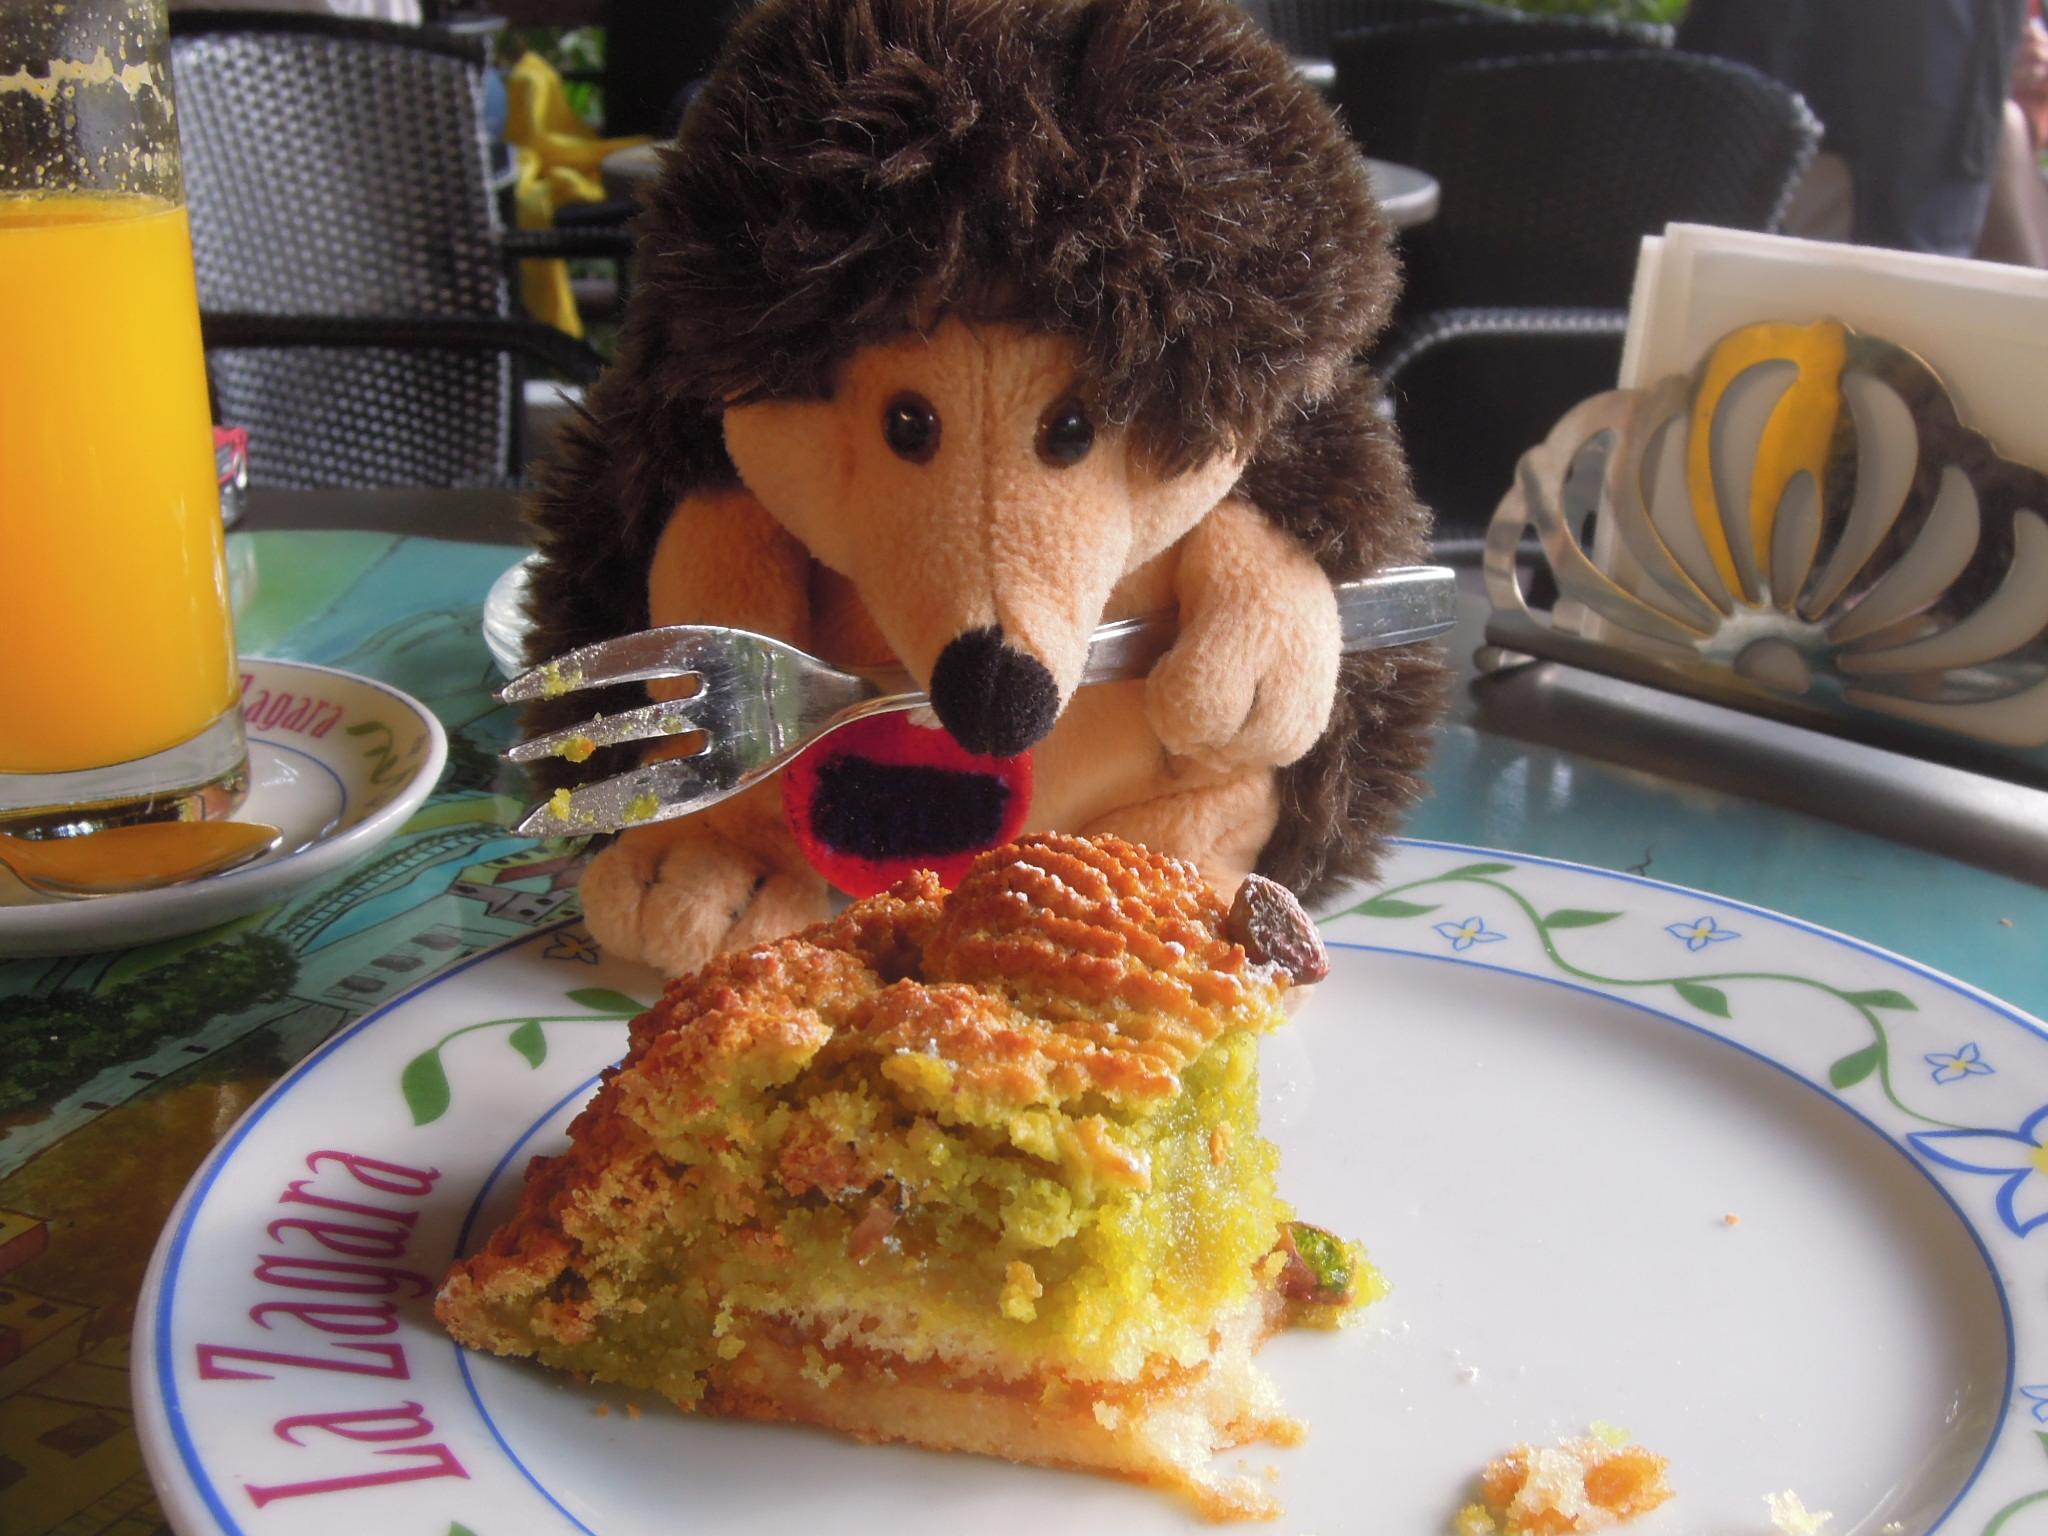 Torquato mangia la torta a Positano